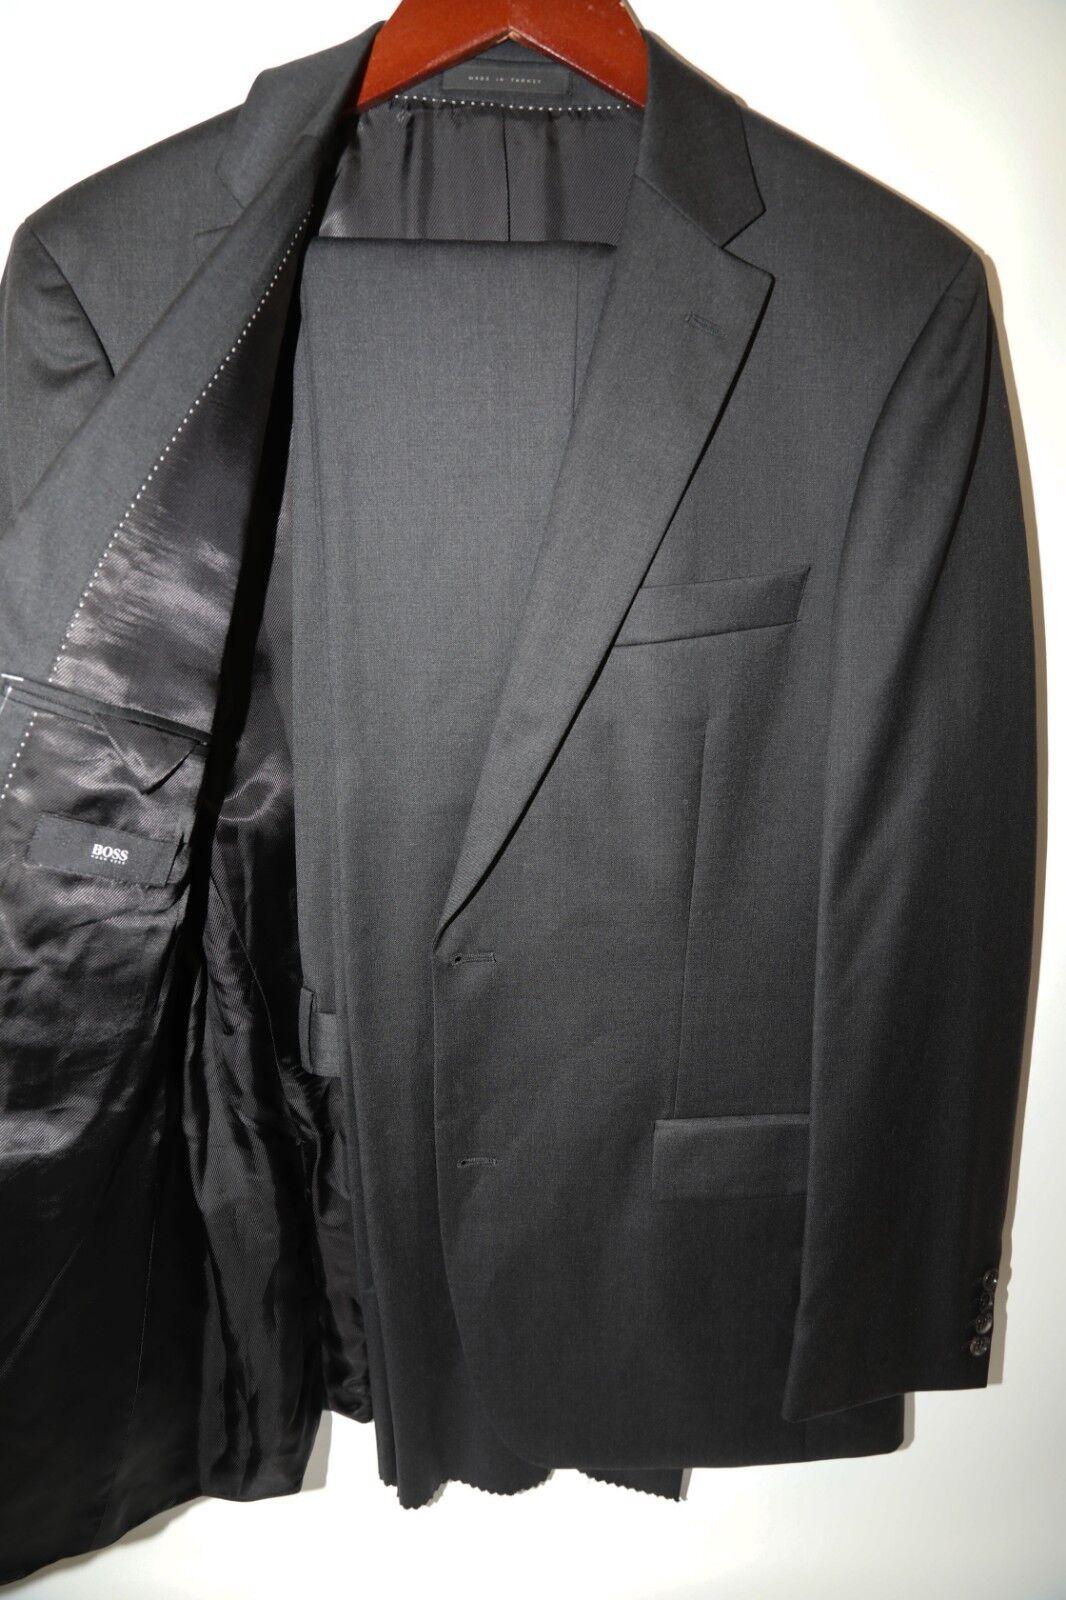 131 Hugo Boss Pasolini Movie US grau Suit Größe 40 L   Super 100